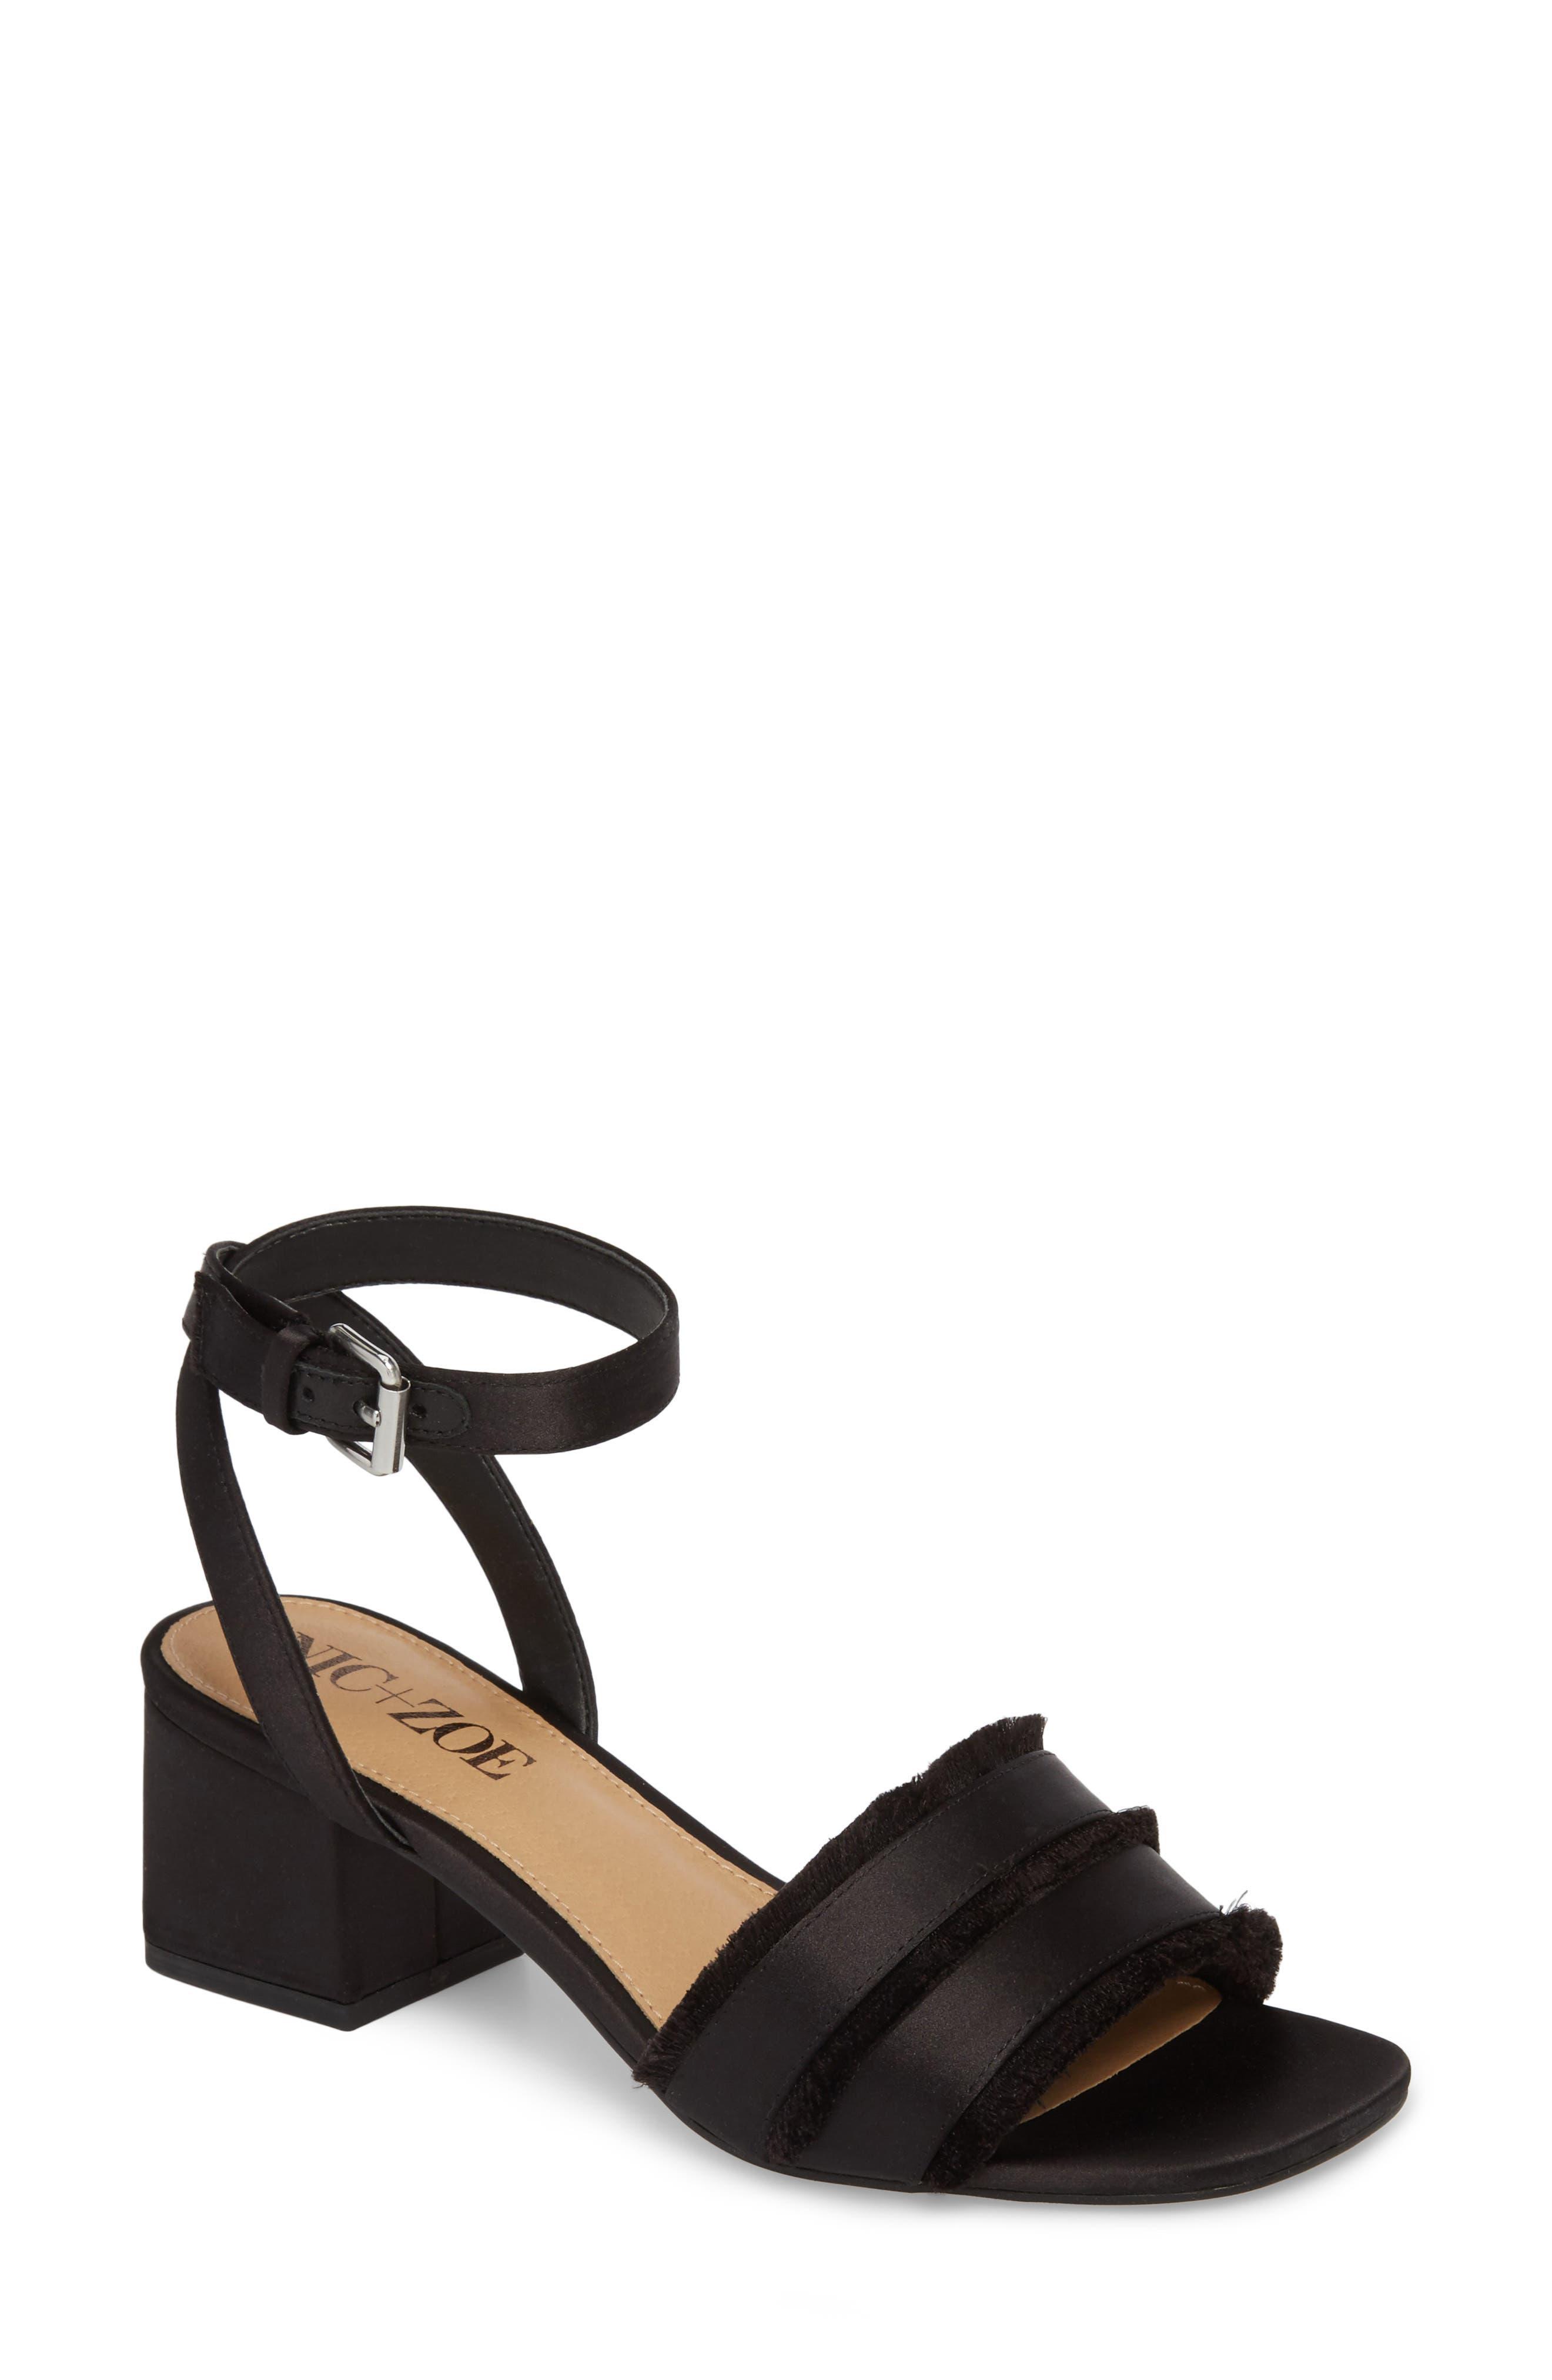 Zaria Fringed Sandal,                         Main,                         color, BLACK SATIN